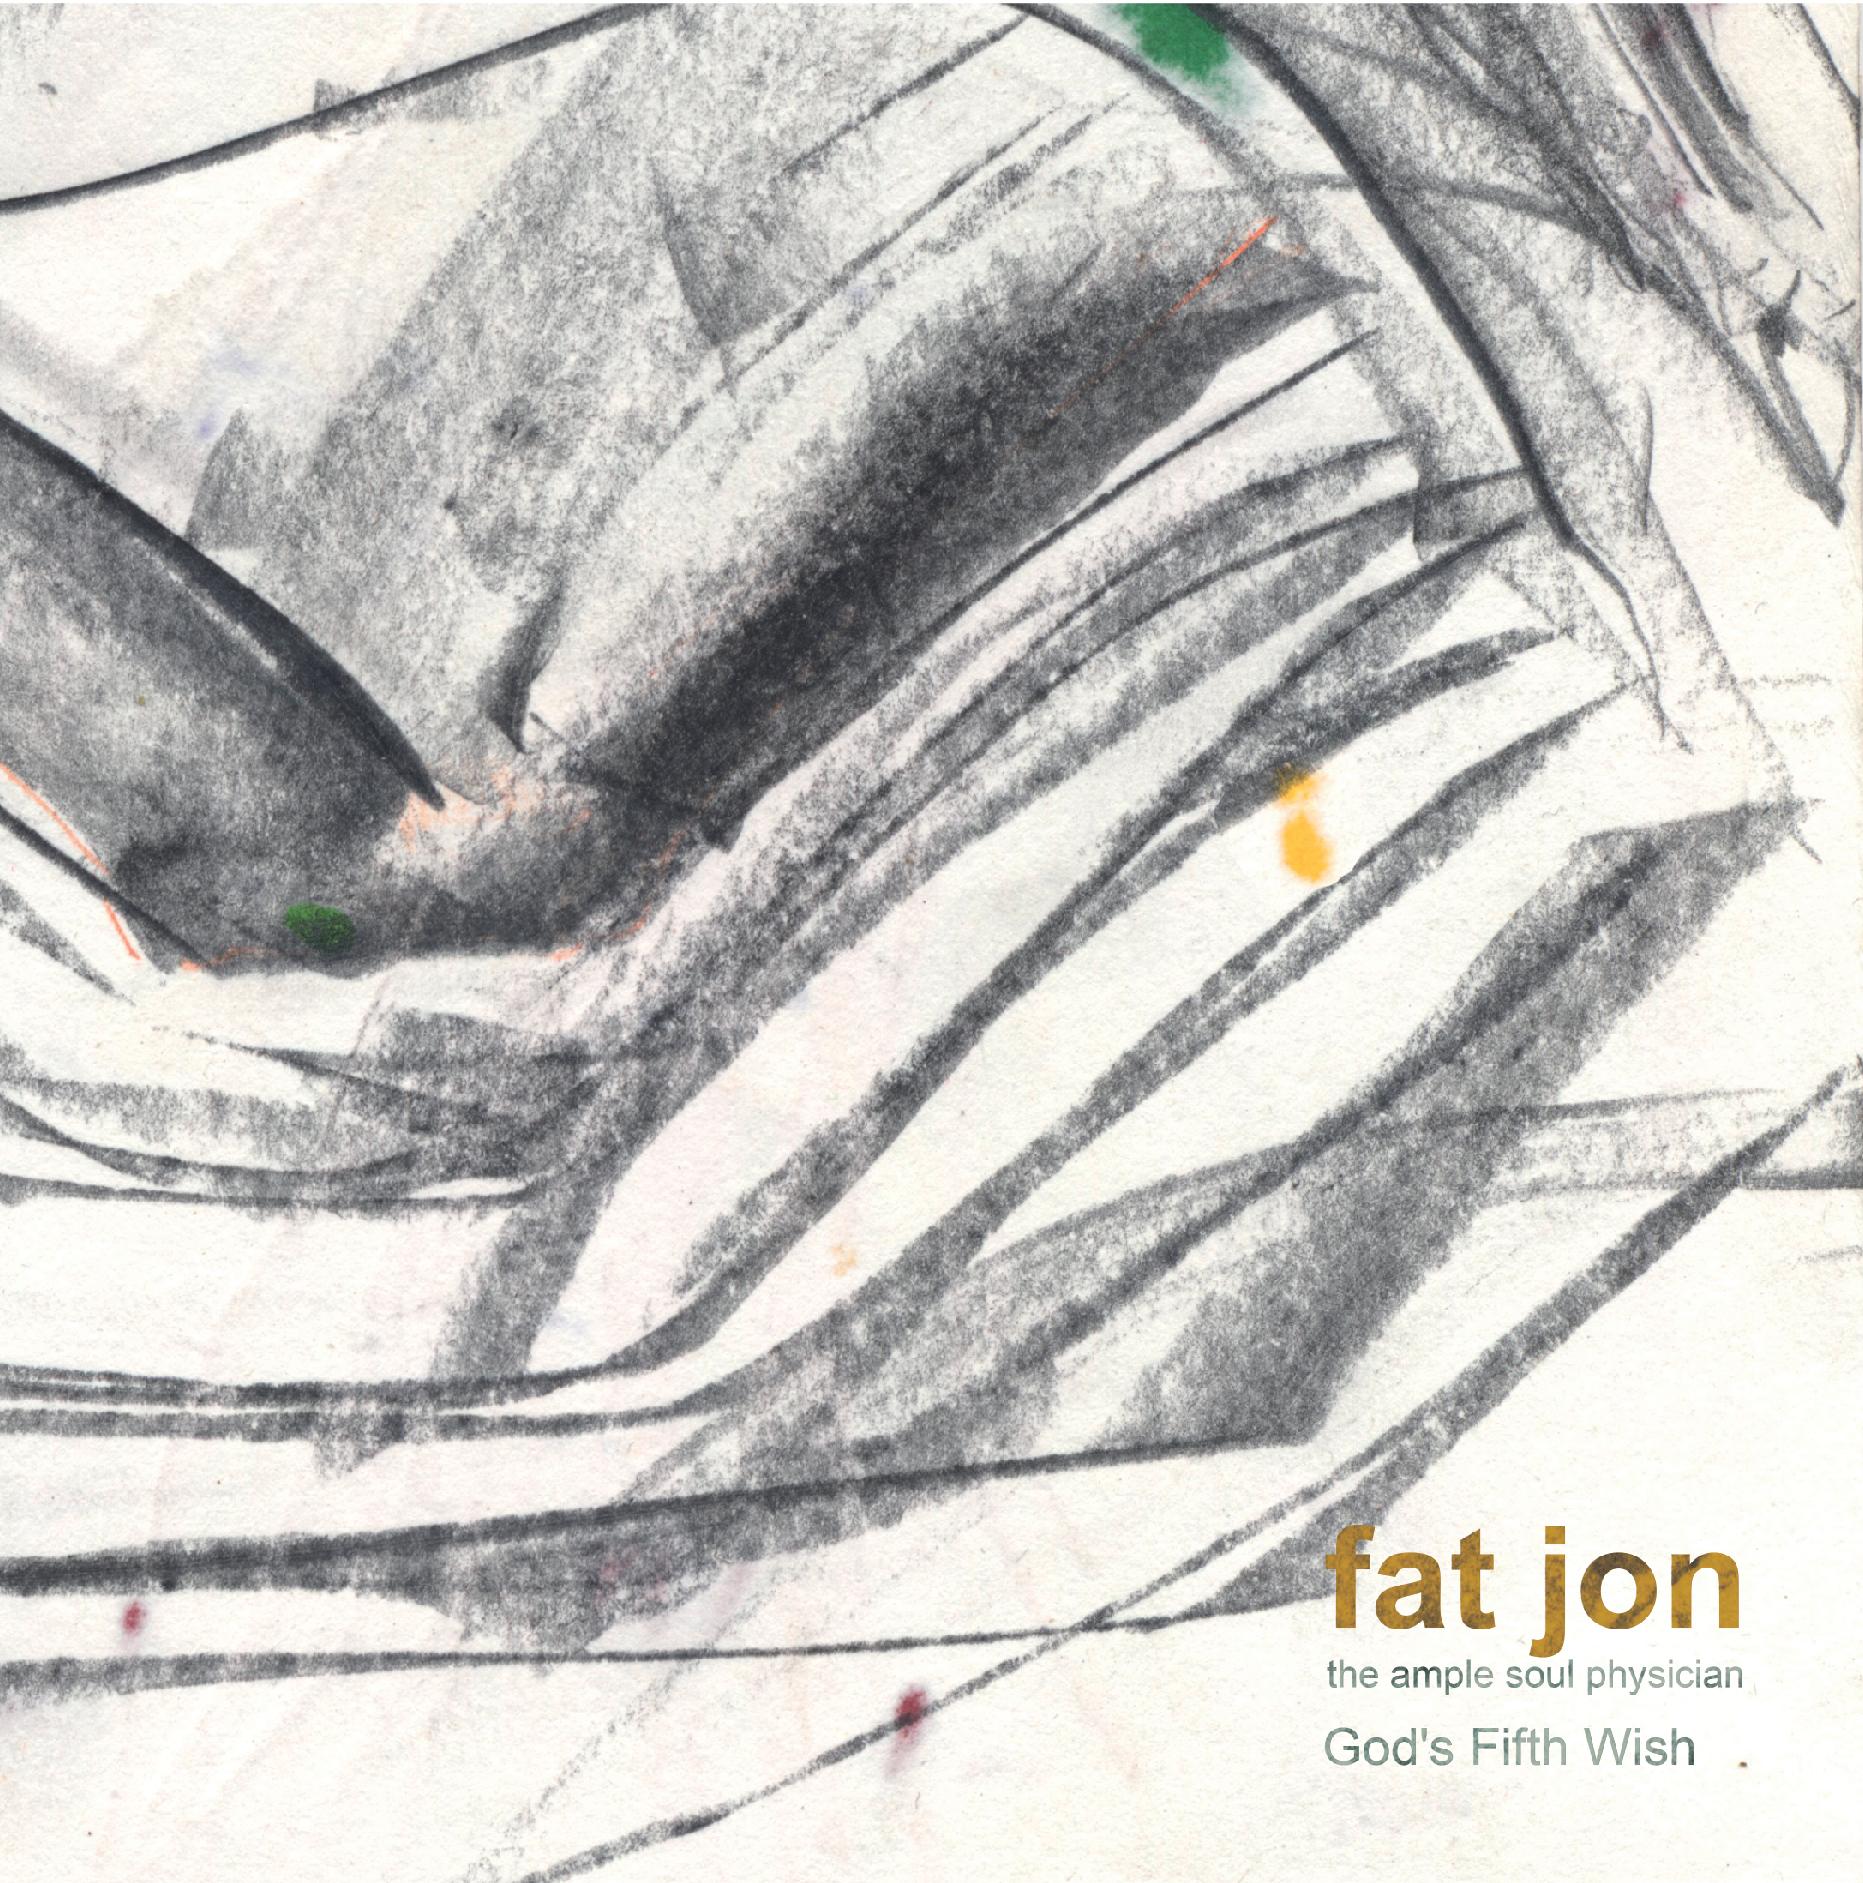 Fat Jon/GOD'S FIFTH WISH COLOR VINYL LP